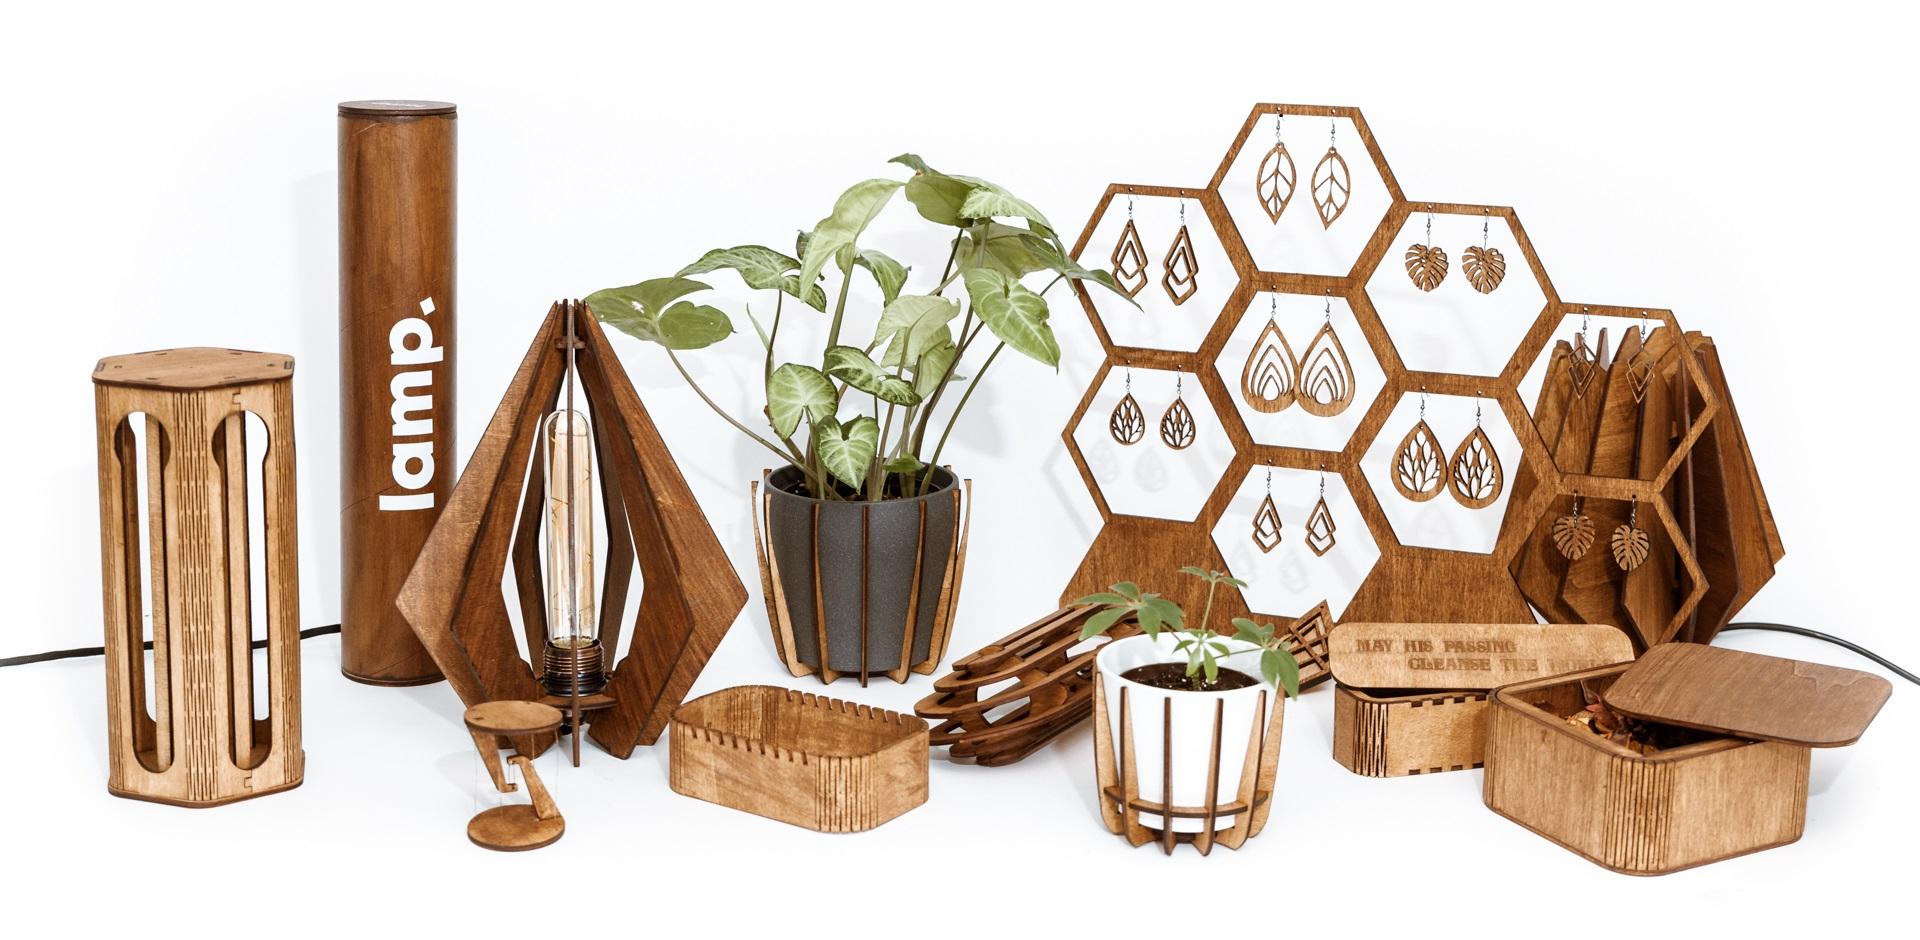 BalkanWave - produse din lemn create cu drag